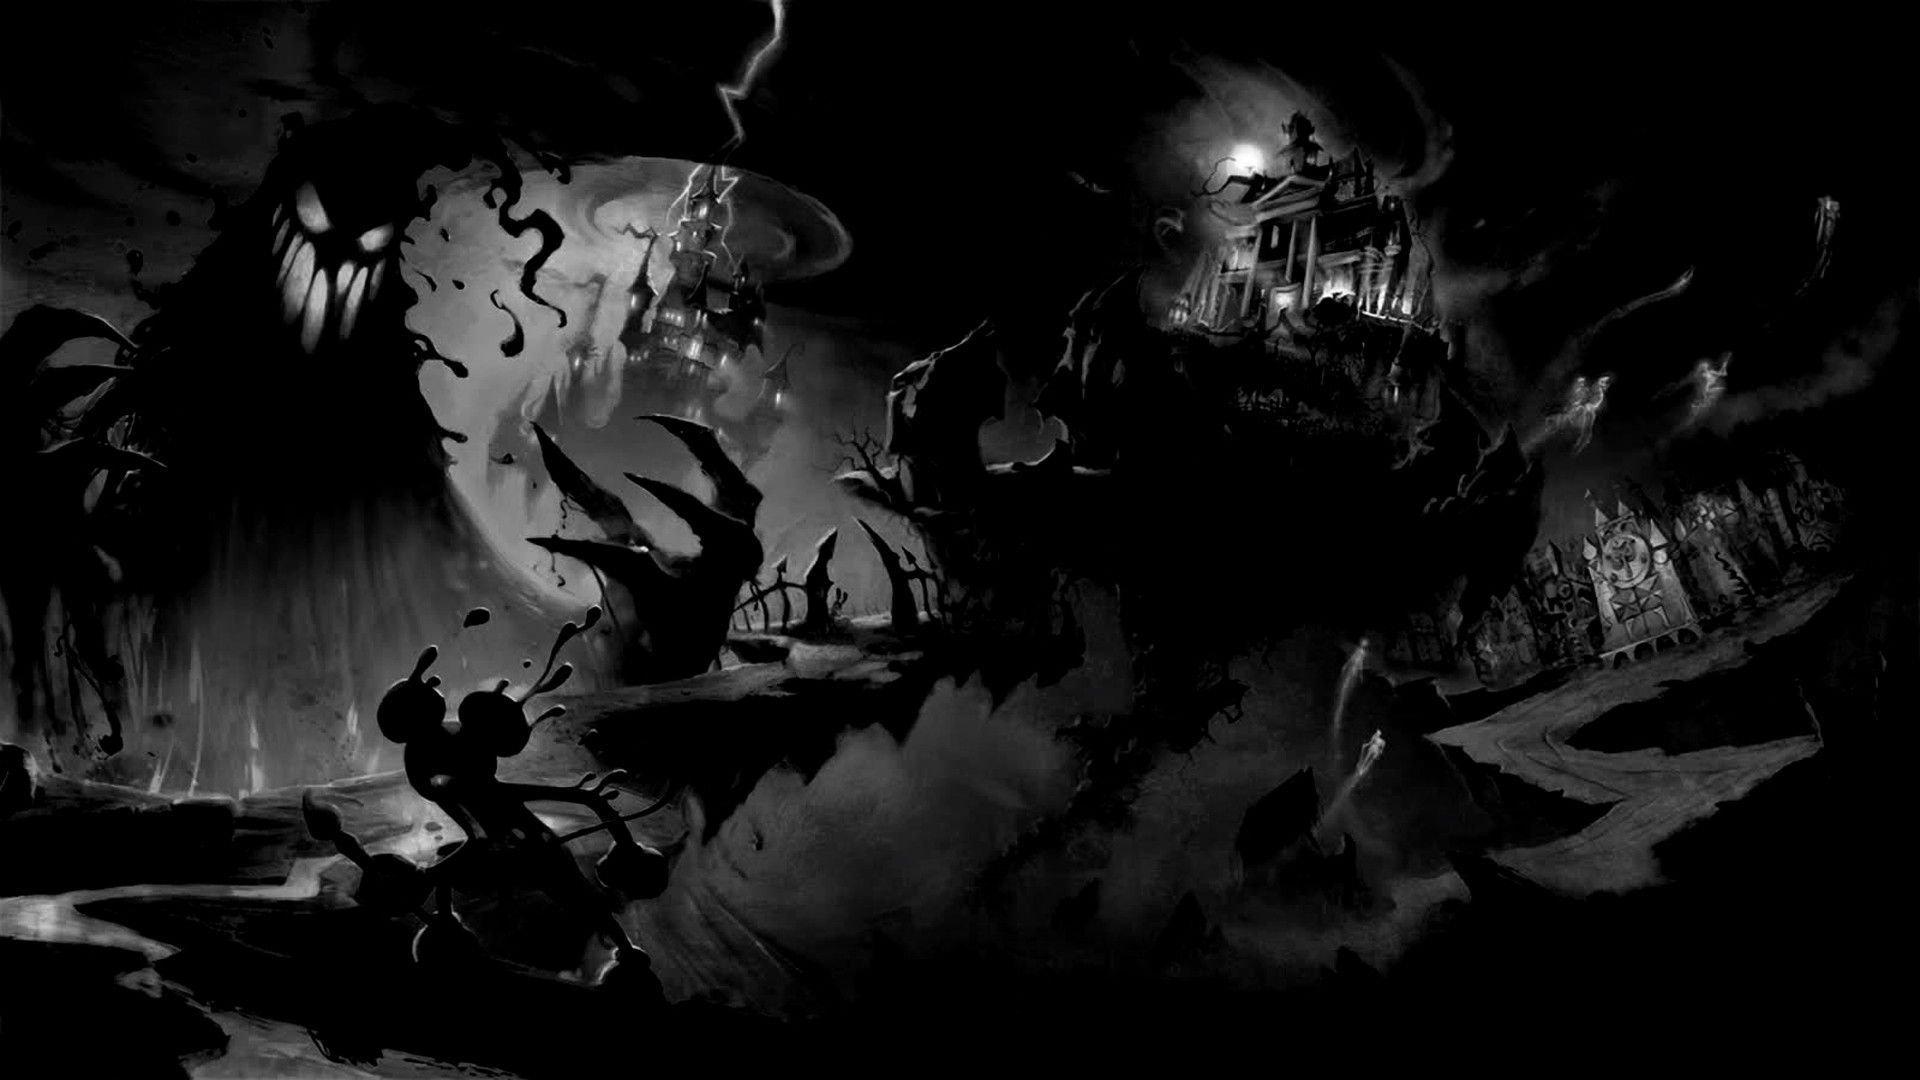 Disney Mickey Mouse Horror Halloween Haunted Wallpaper 1920x1080